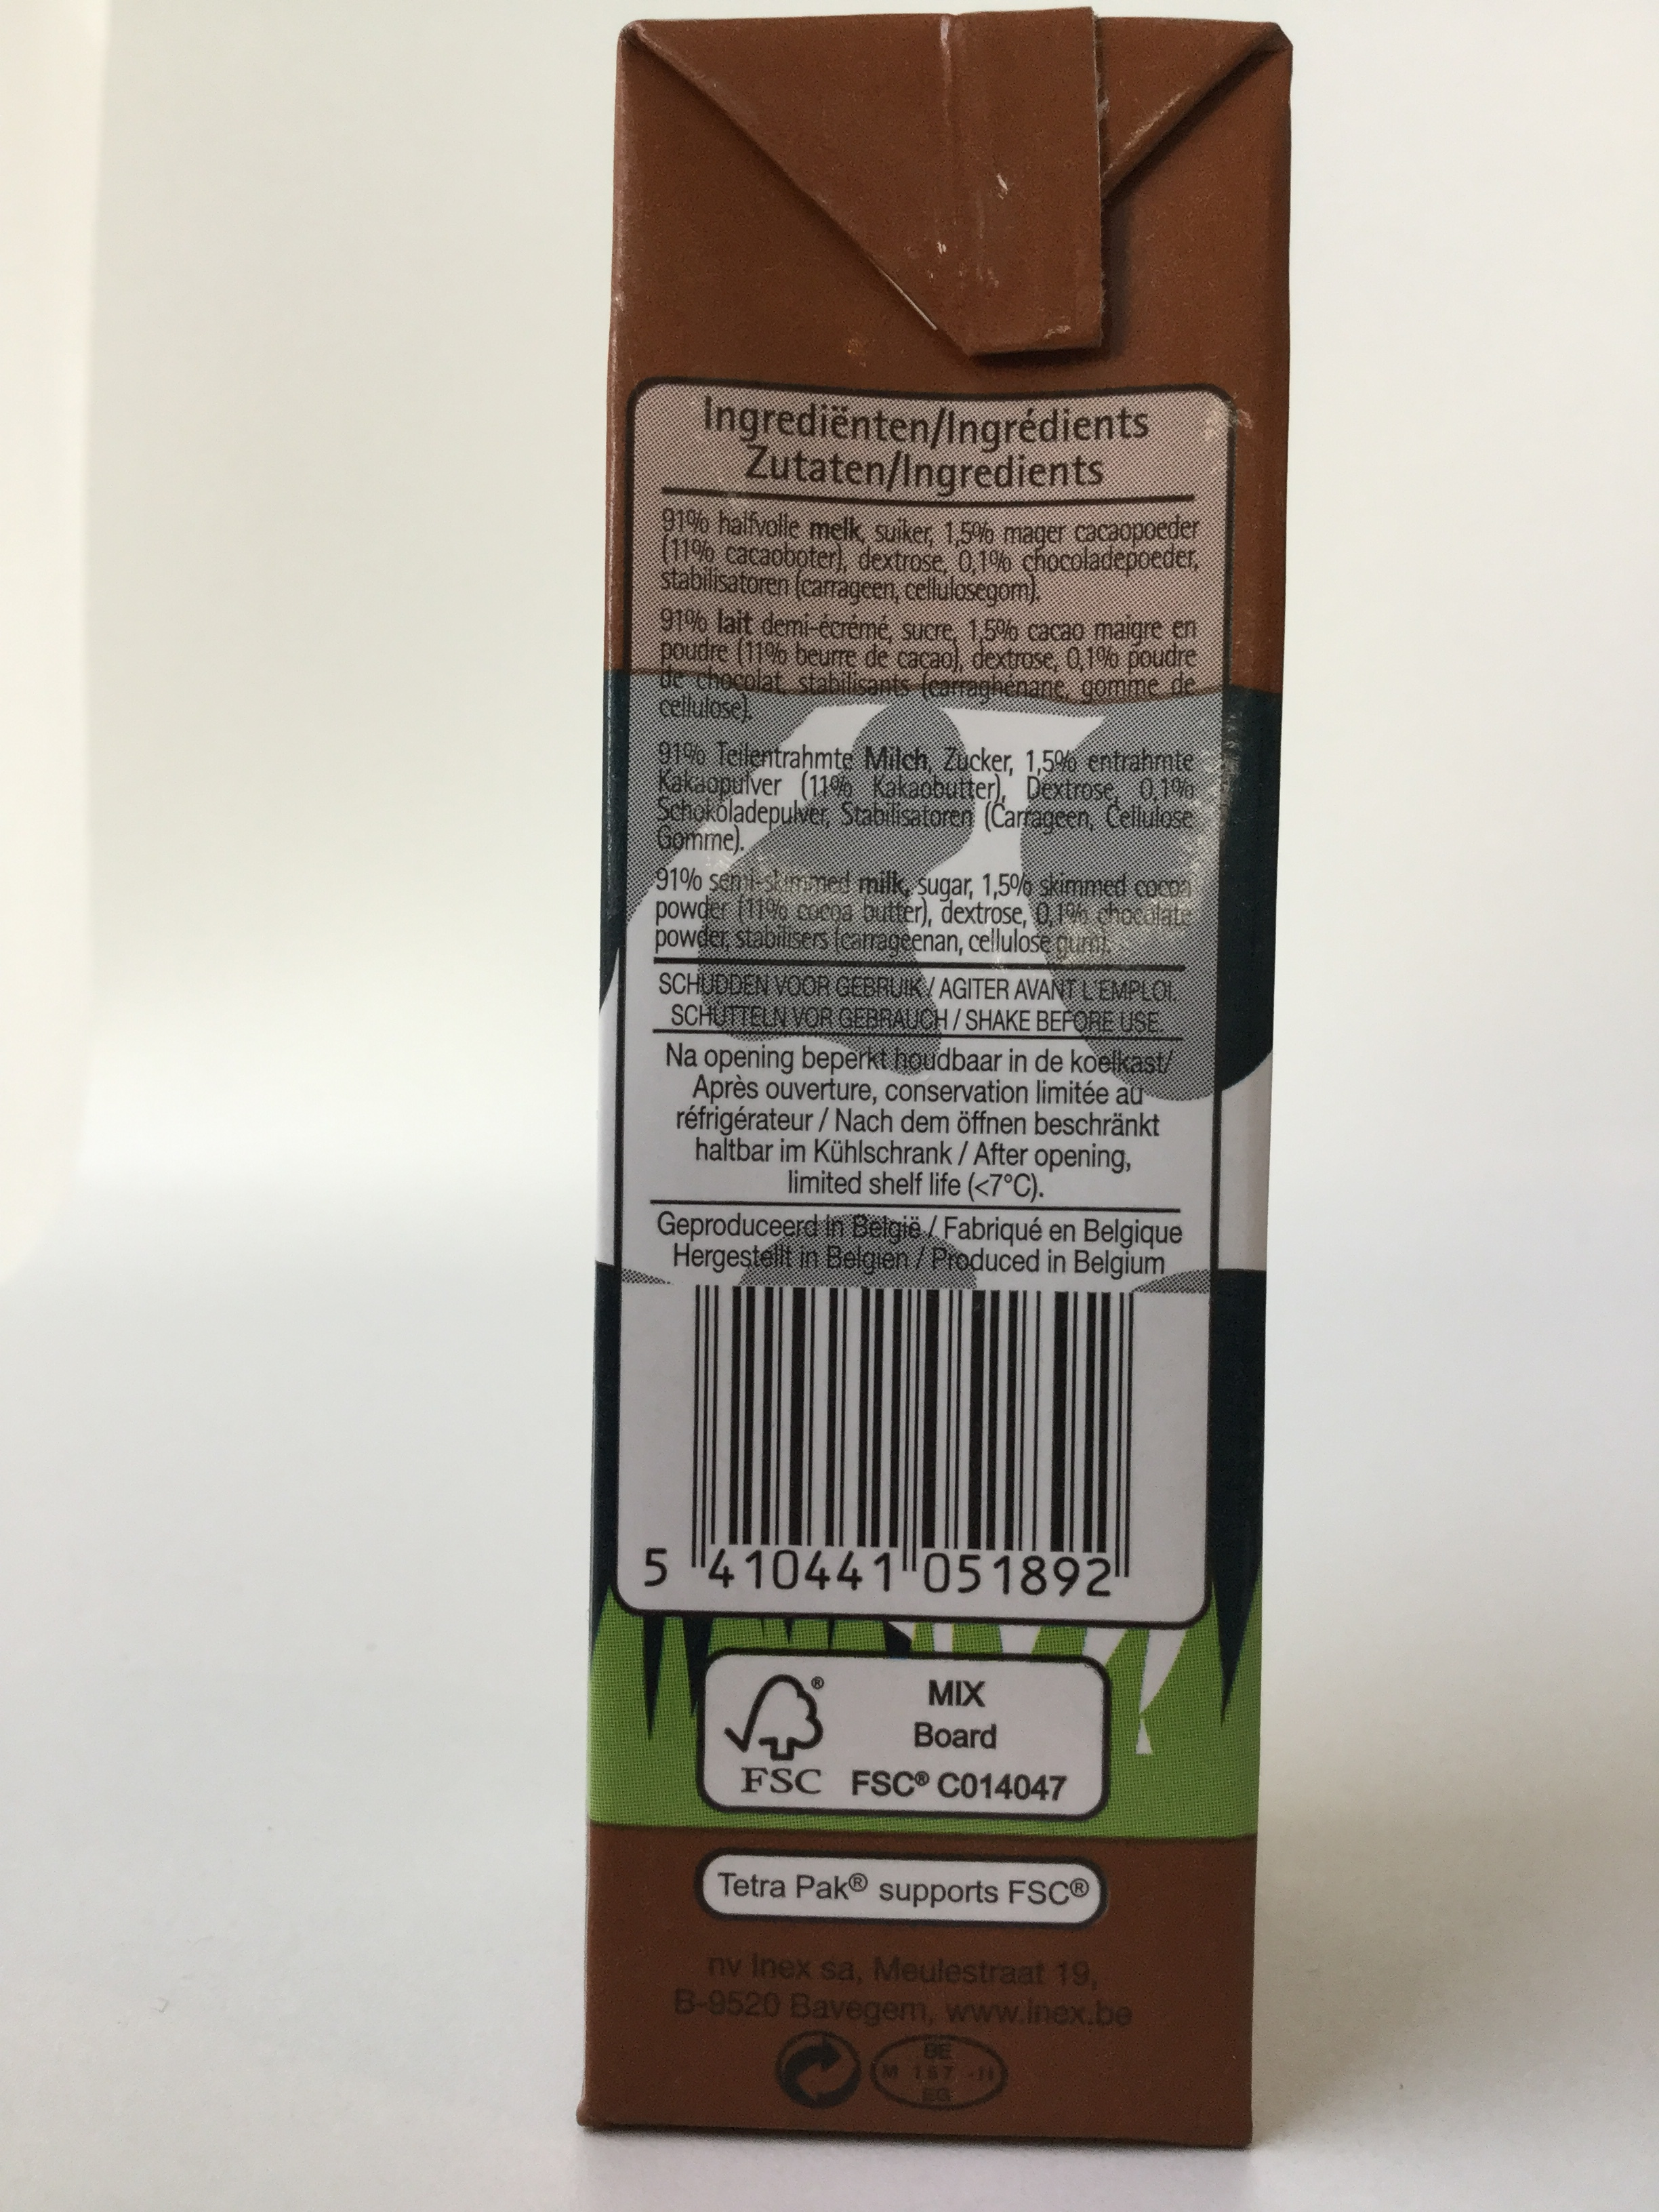 Inex Chocolademelk Side 2